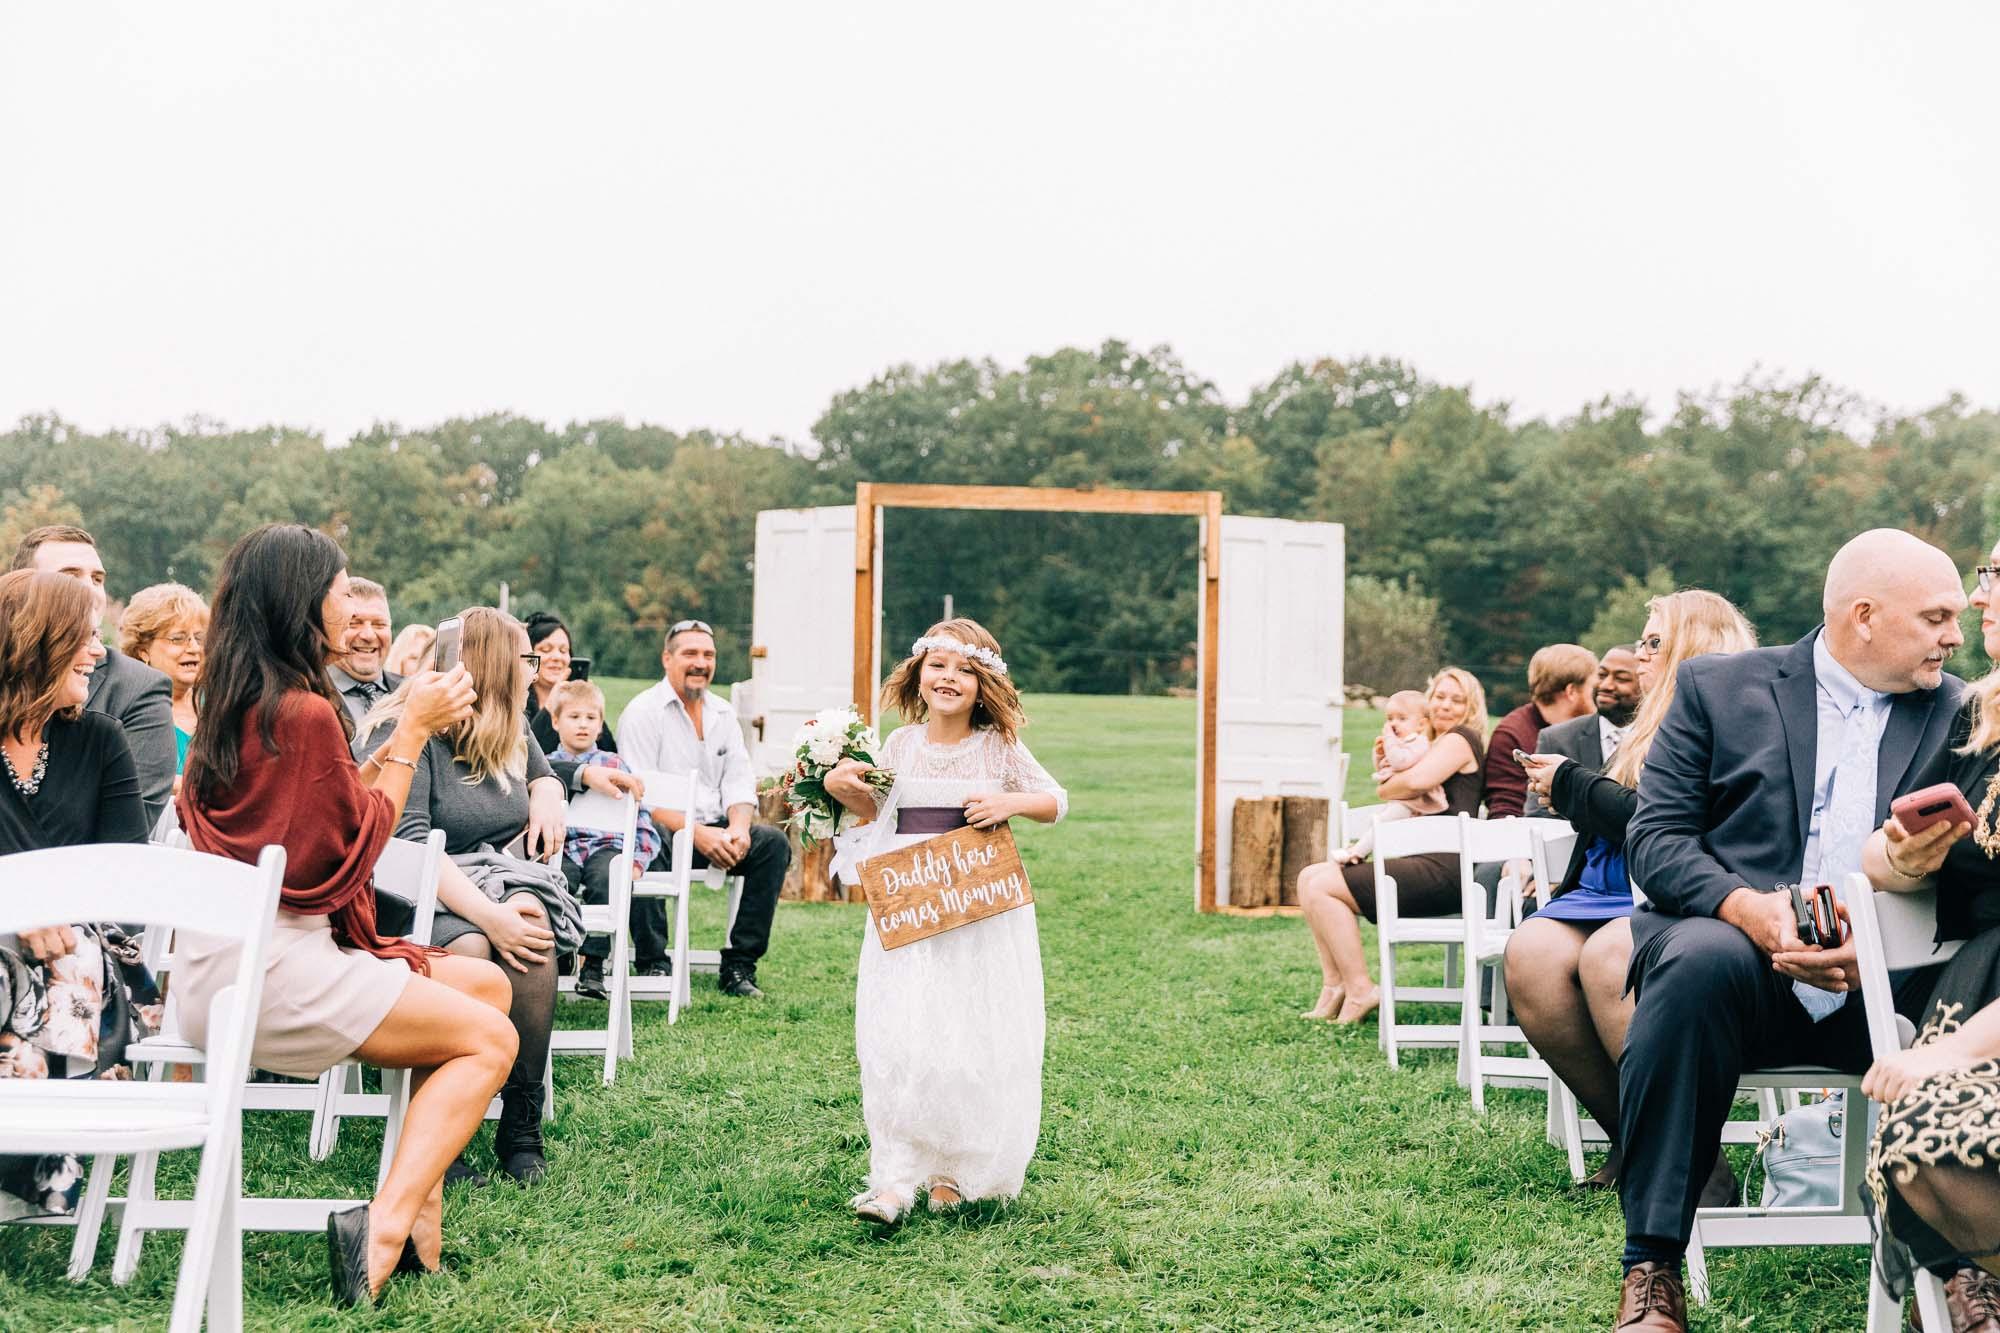 Lodge-at-Raven-Creek-October-wedding-20.jpg